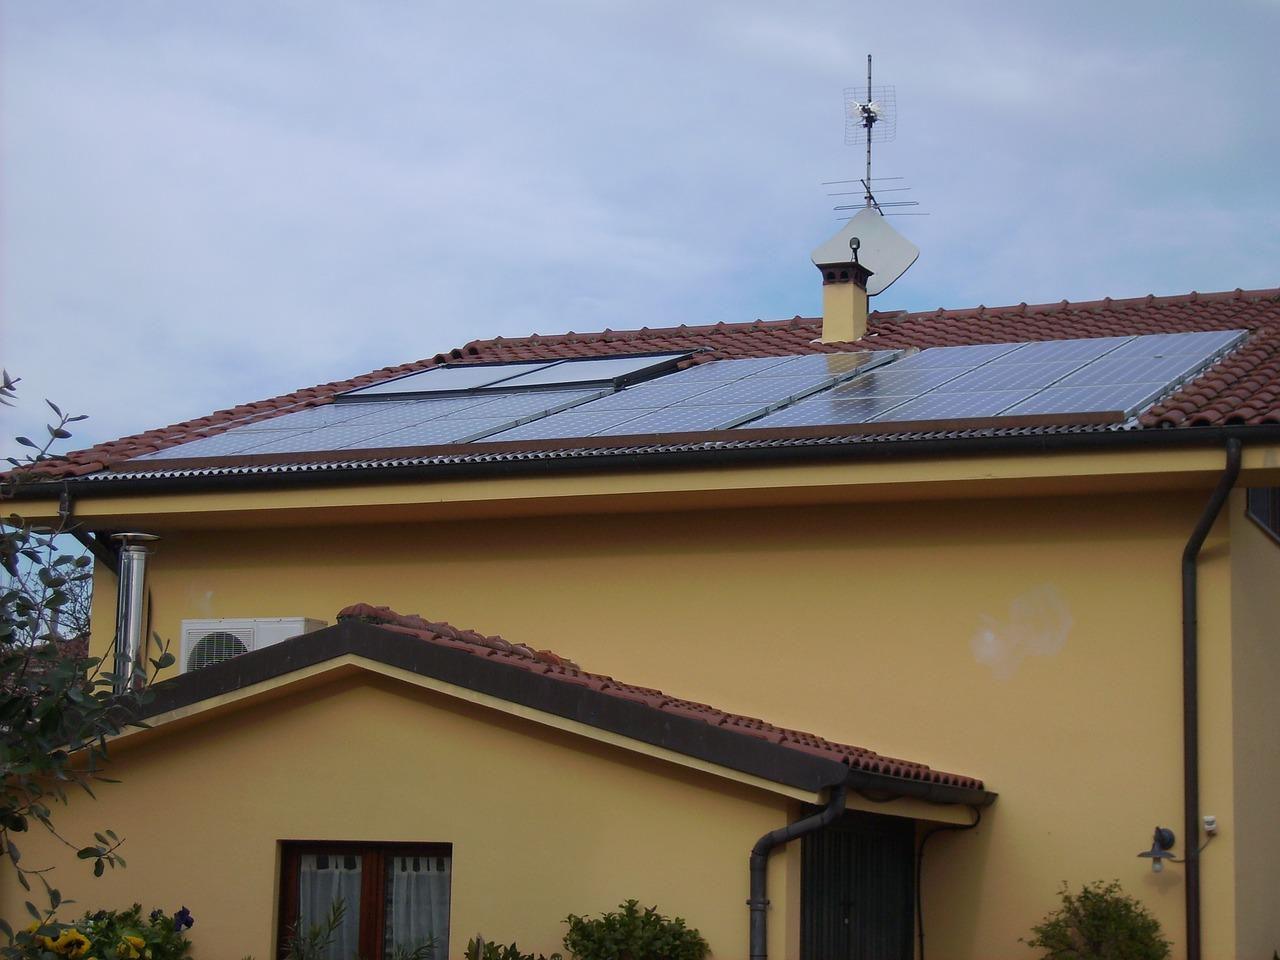 Solarenergie Solarplatte Dach Solarthermie